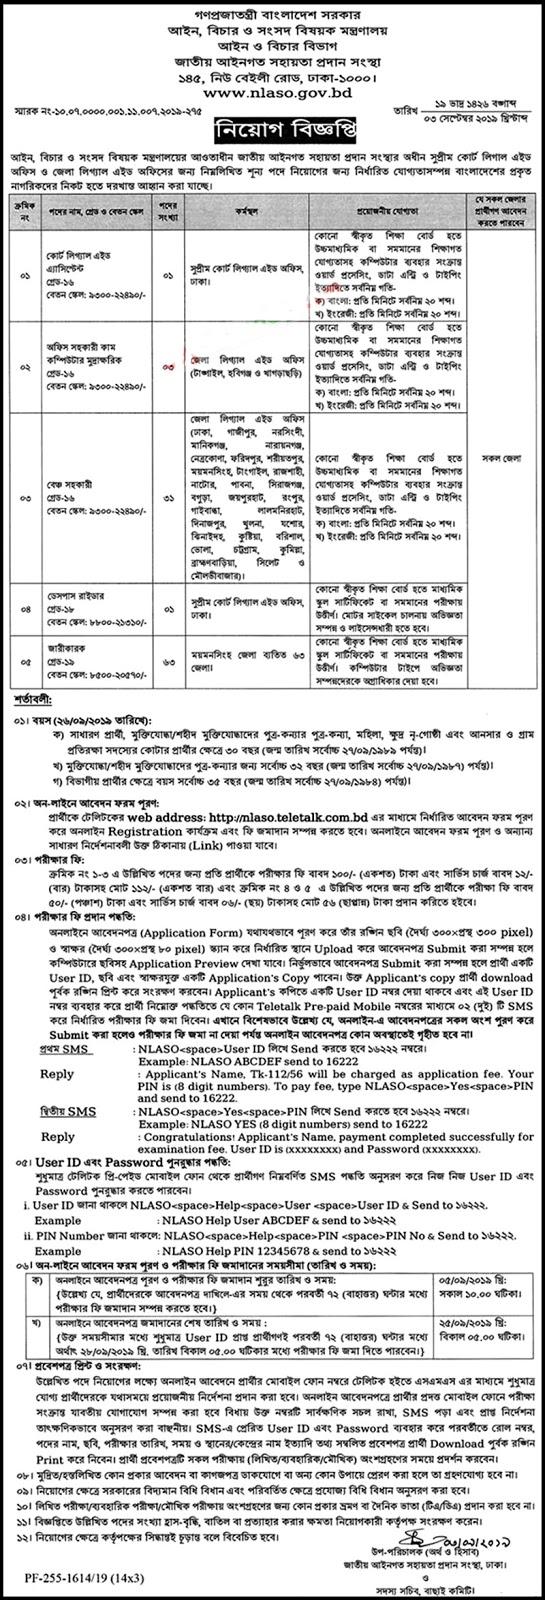 National Legal Aid Services Organization (NLASO) Job Circular 2019